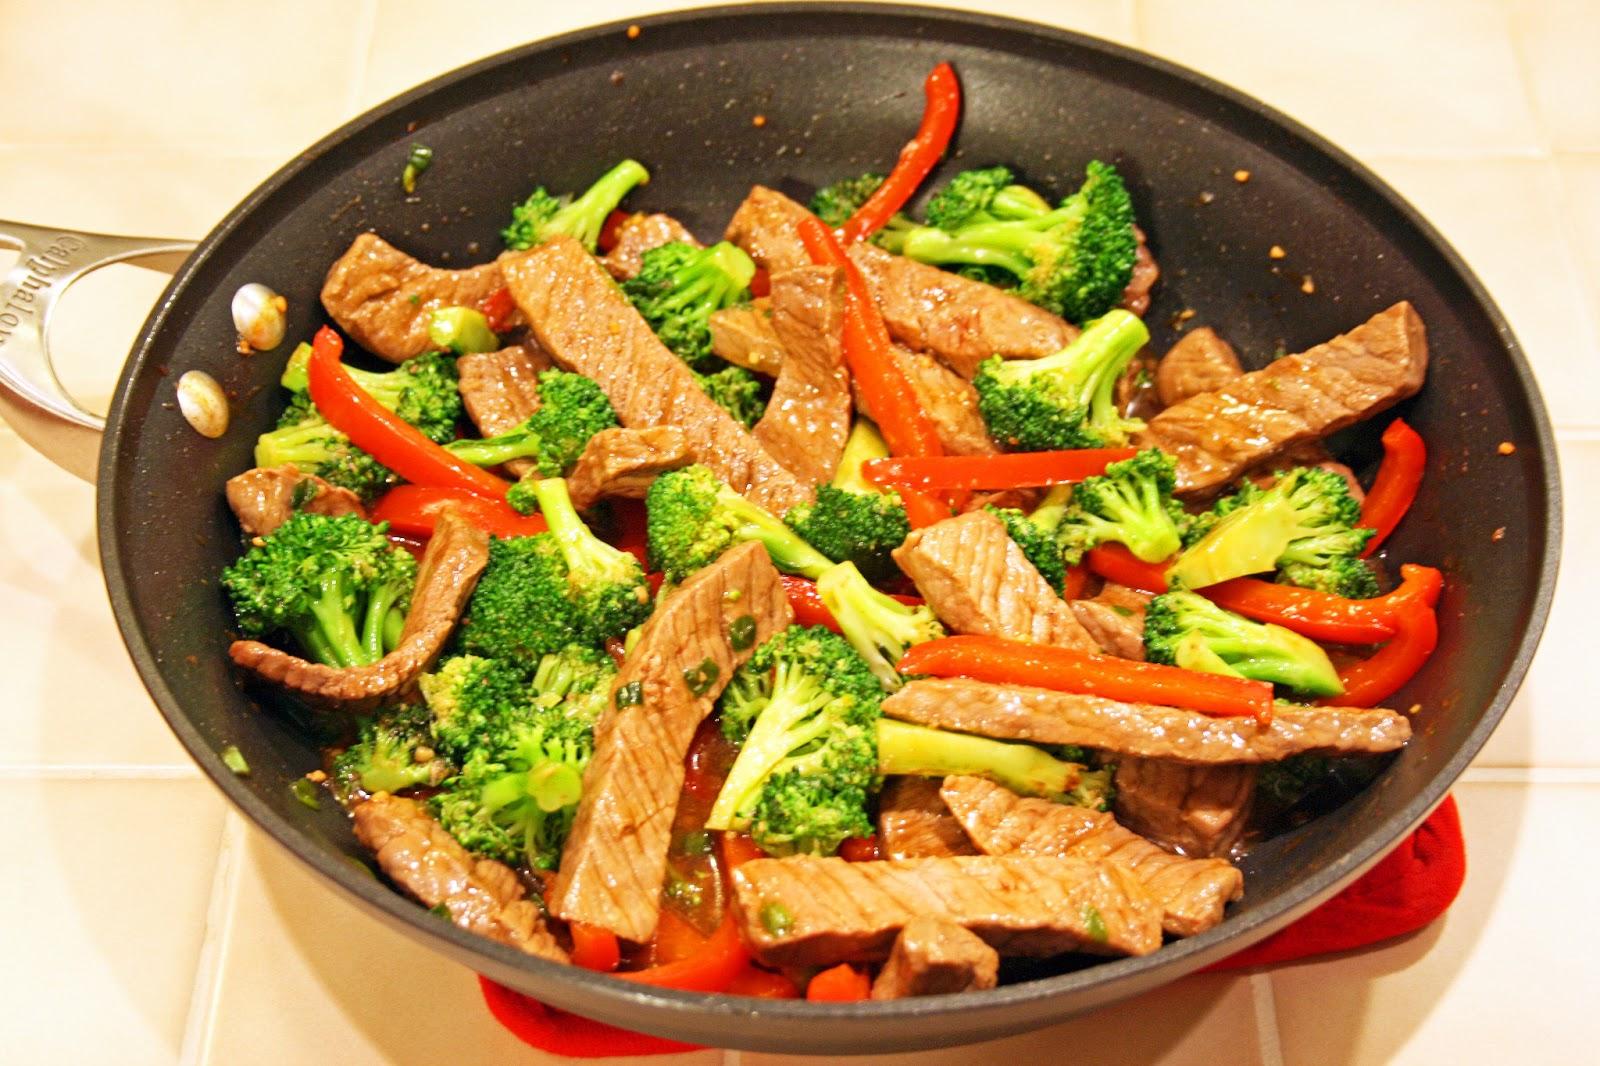 Healthy Spa Food Recipes